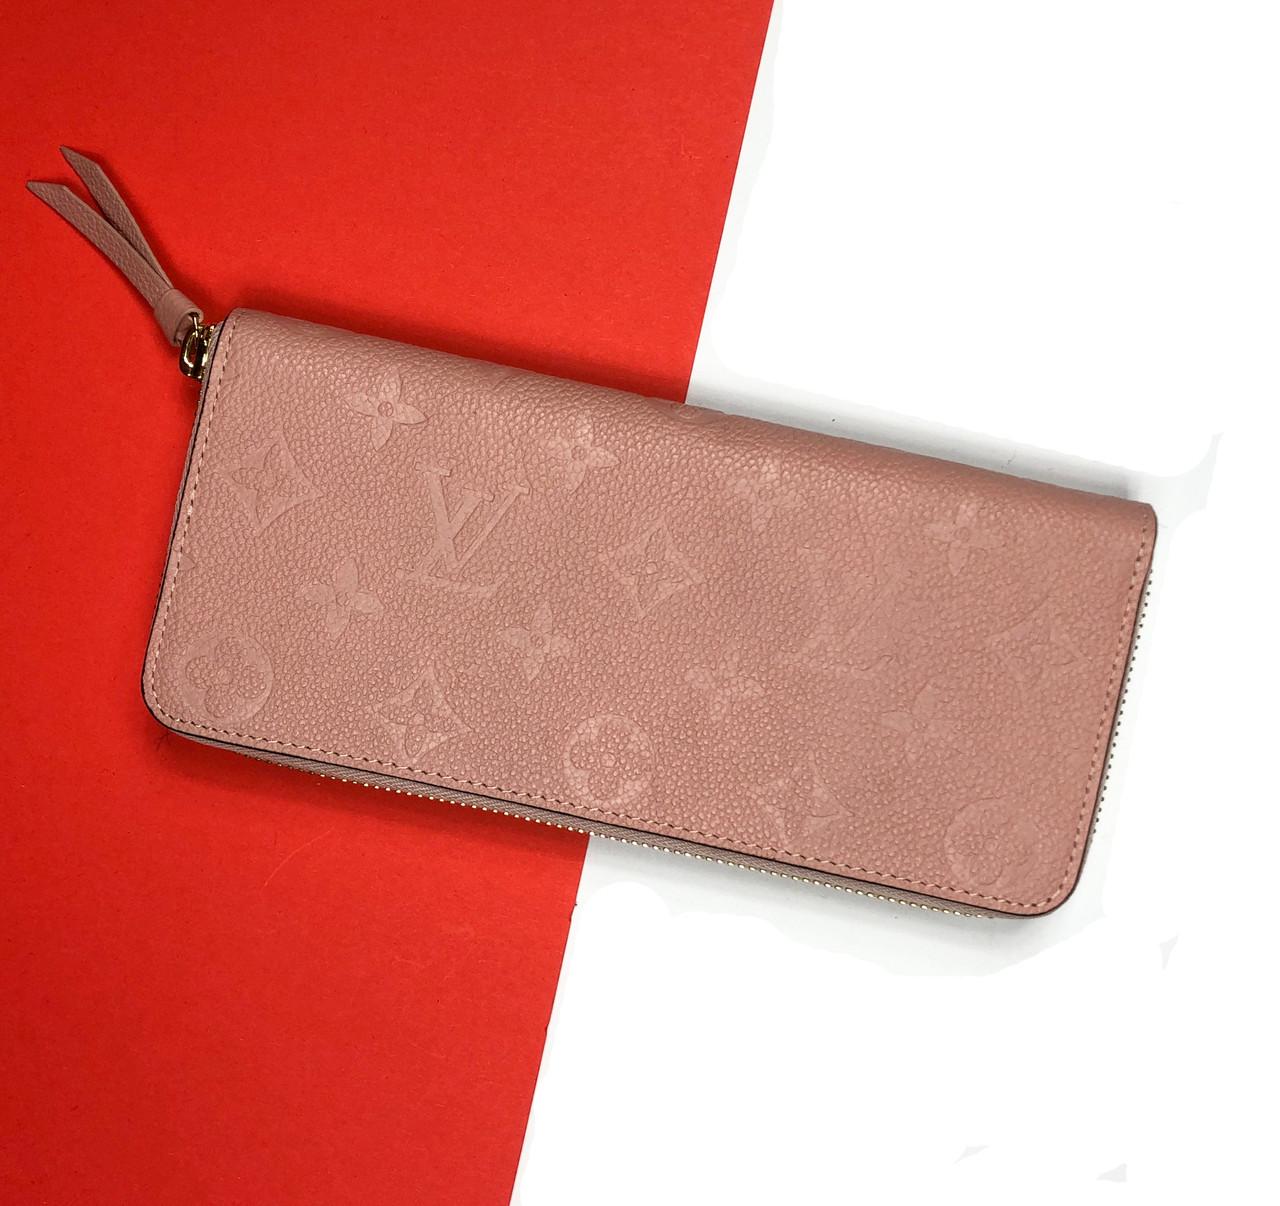 Кошелек Louis Vuitton CLEMENCE розовый (Луи Виттон) арт. 22-05